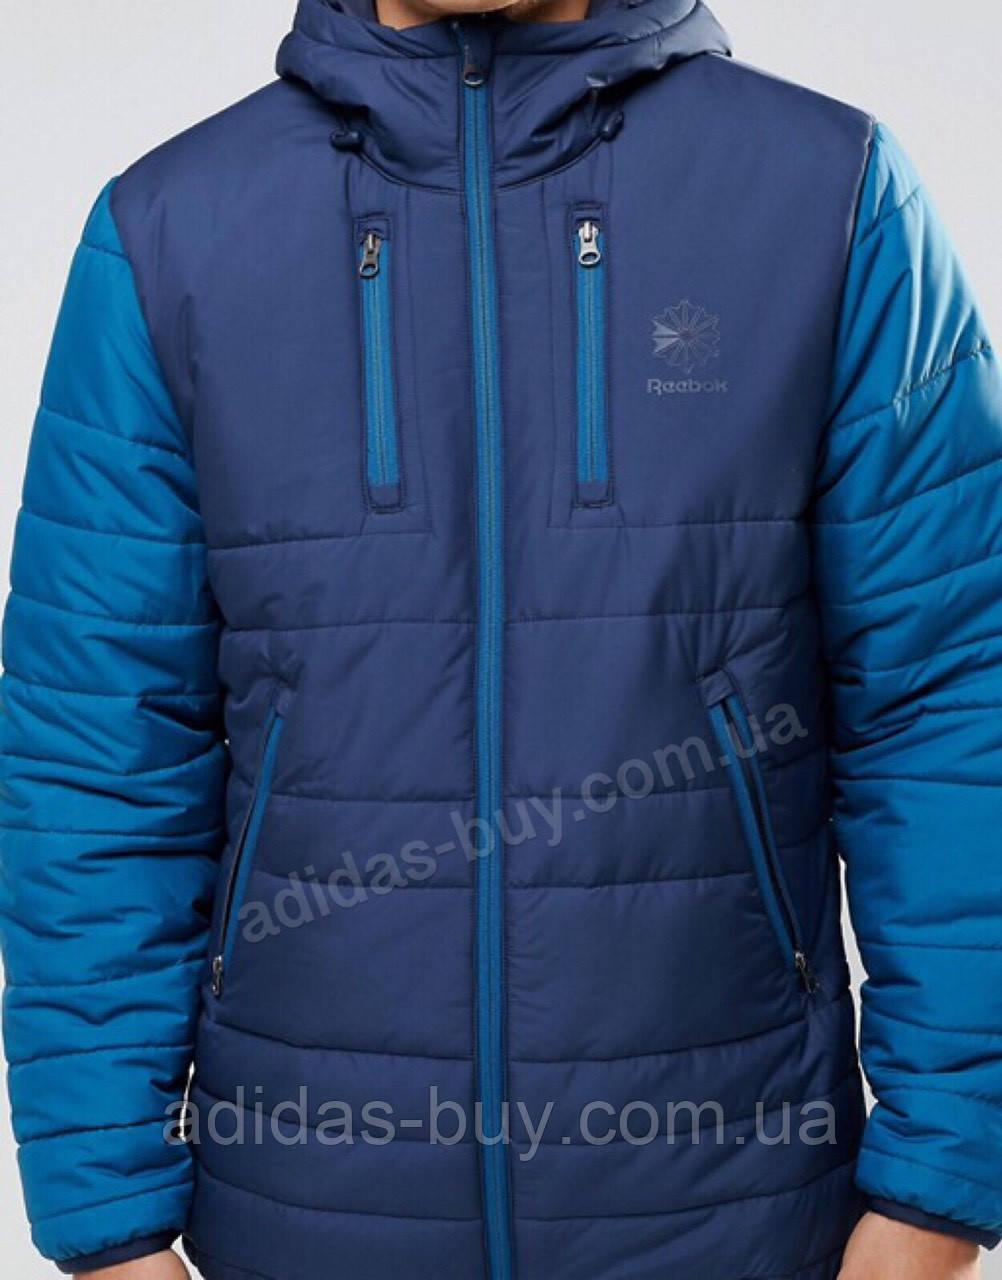 9cc5331149cb Куртка мужская оригинальная зимняя Reebok PADDED MID 2 JACKET AY1251 ц